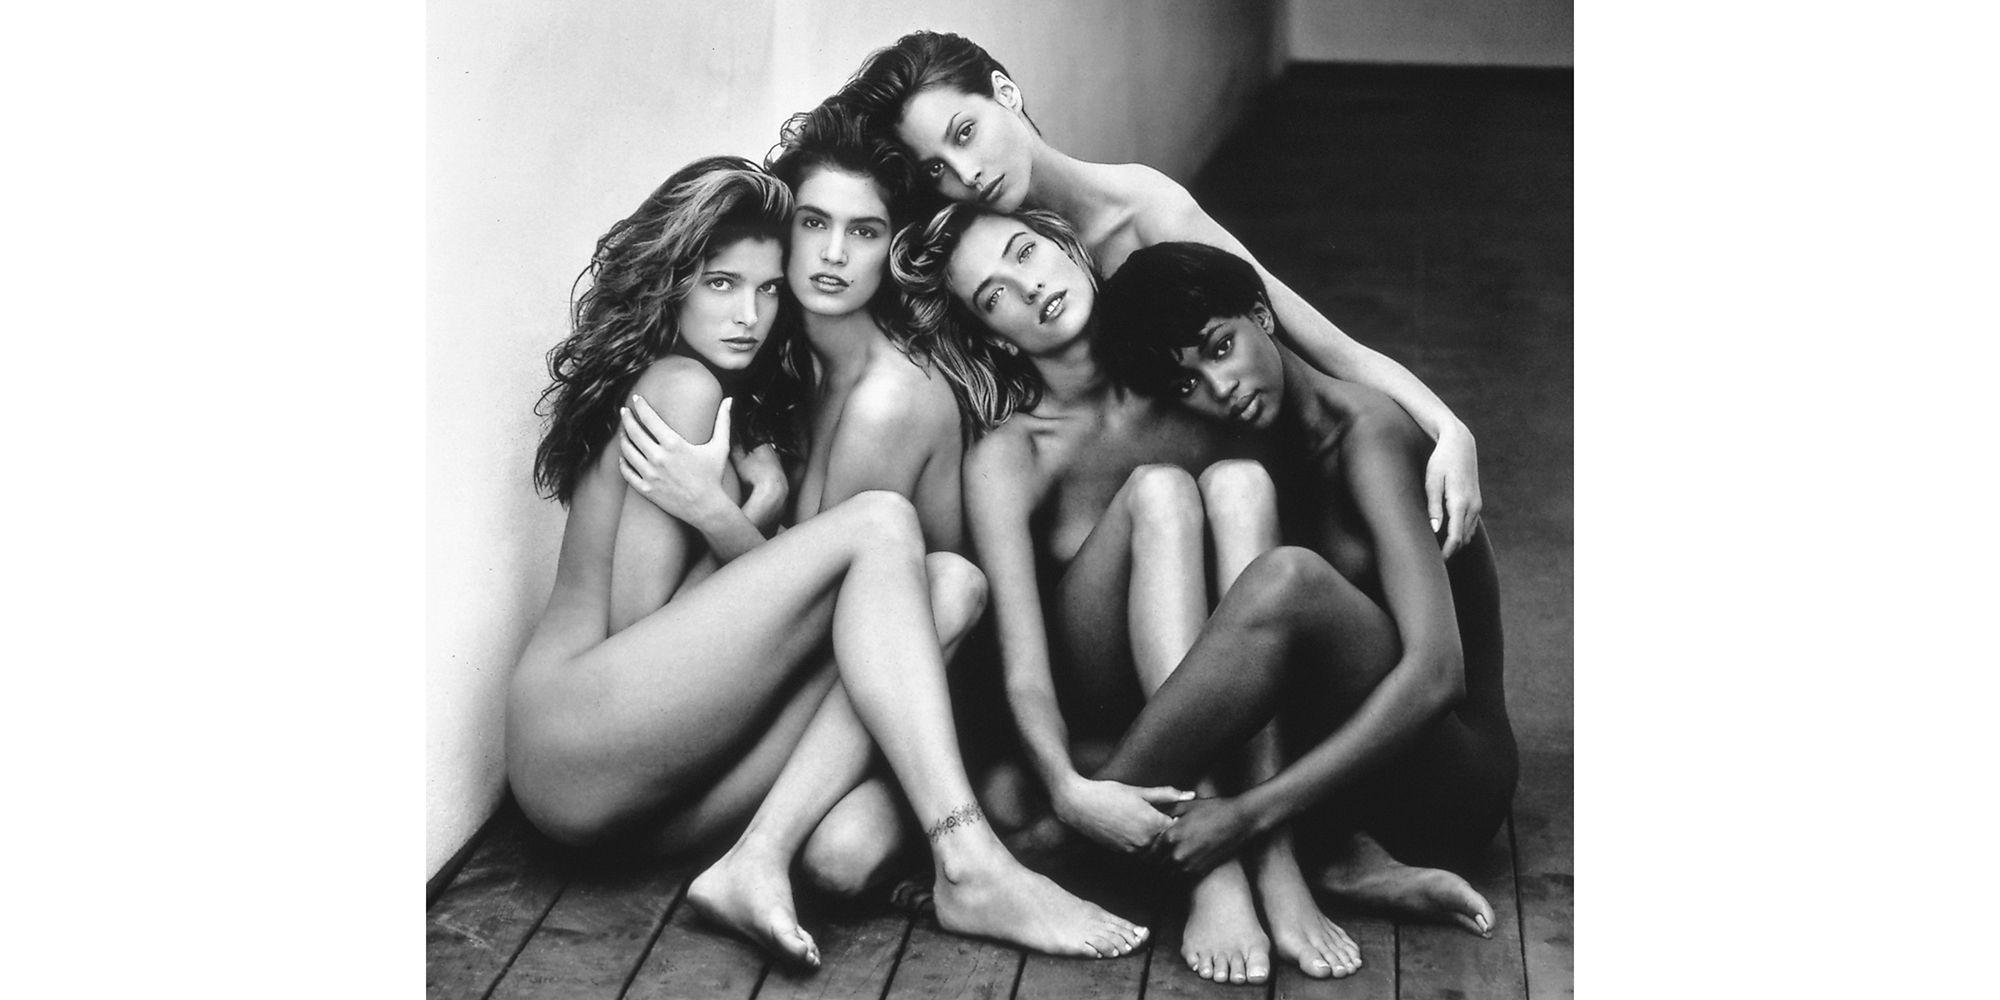 <em>Stephanie, Cindy, Christy, Tatjana, Naomi, Hollywood</em>, 1989